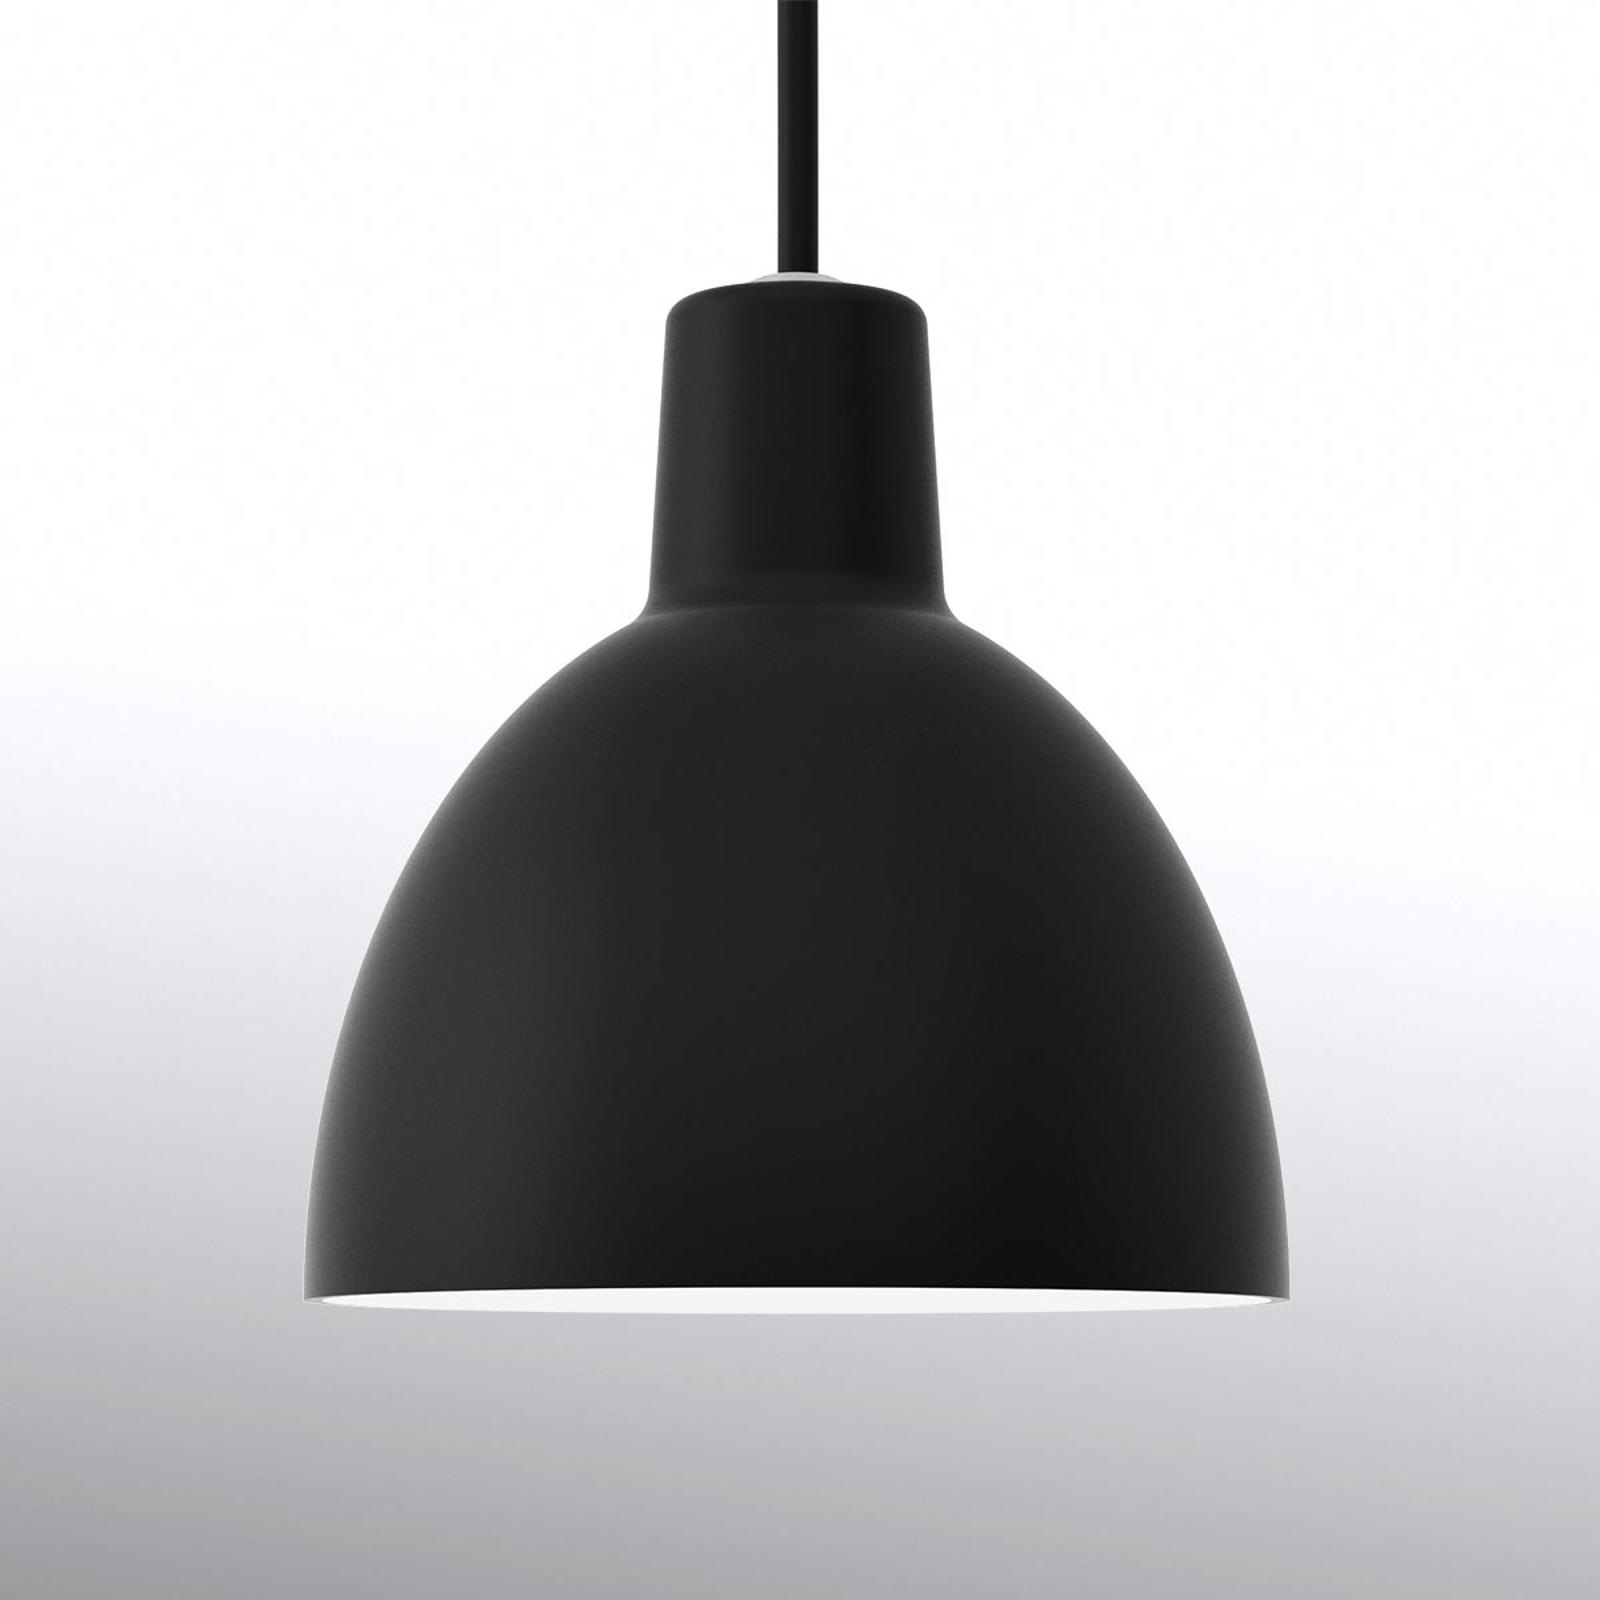 Louis Poulsen Toldbod 120 – pendellampe svart